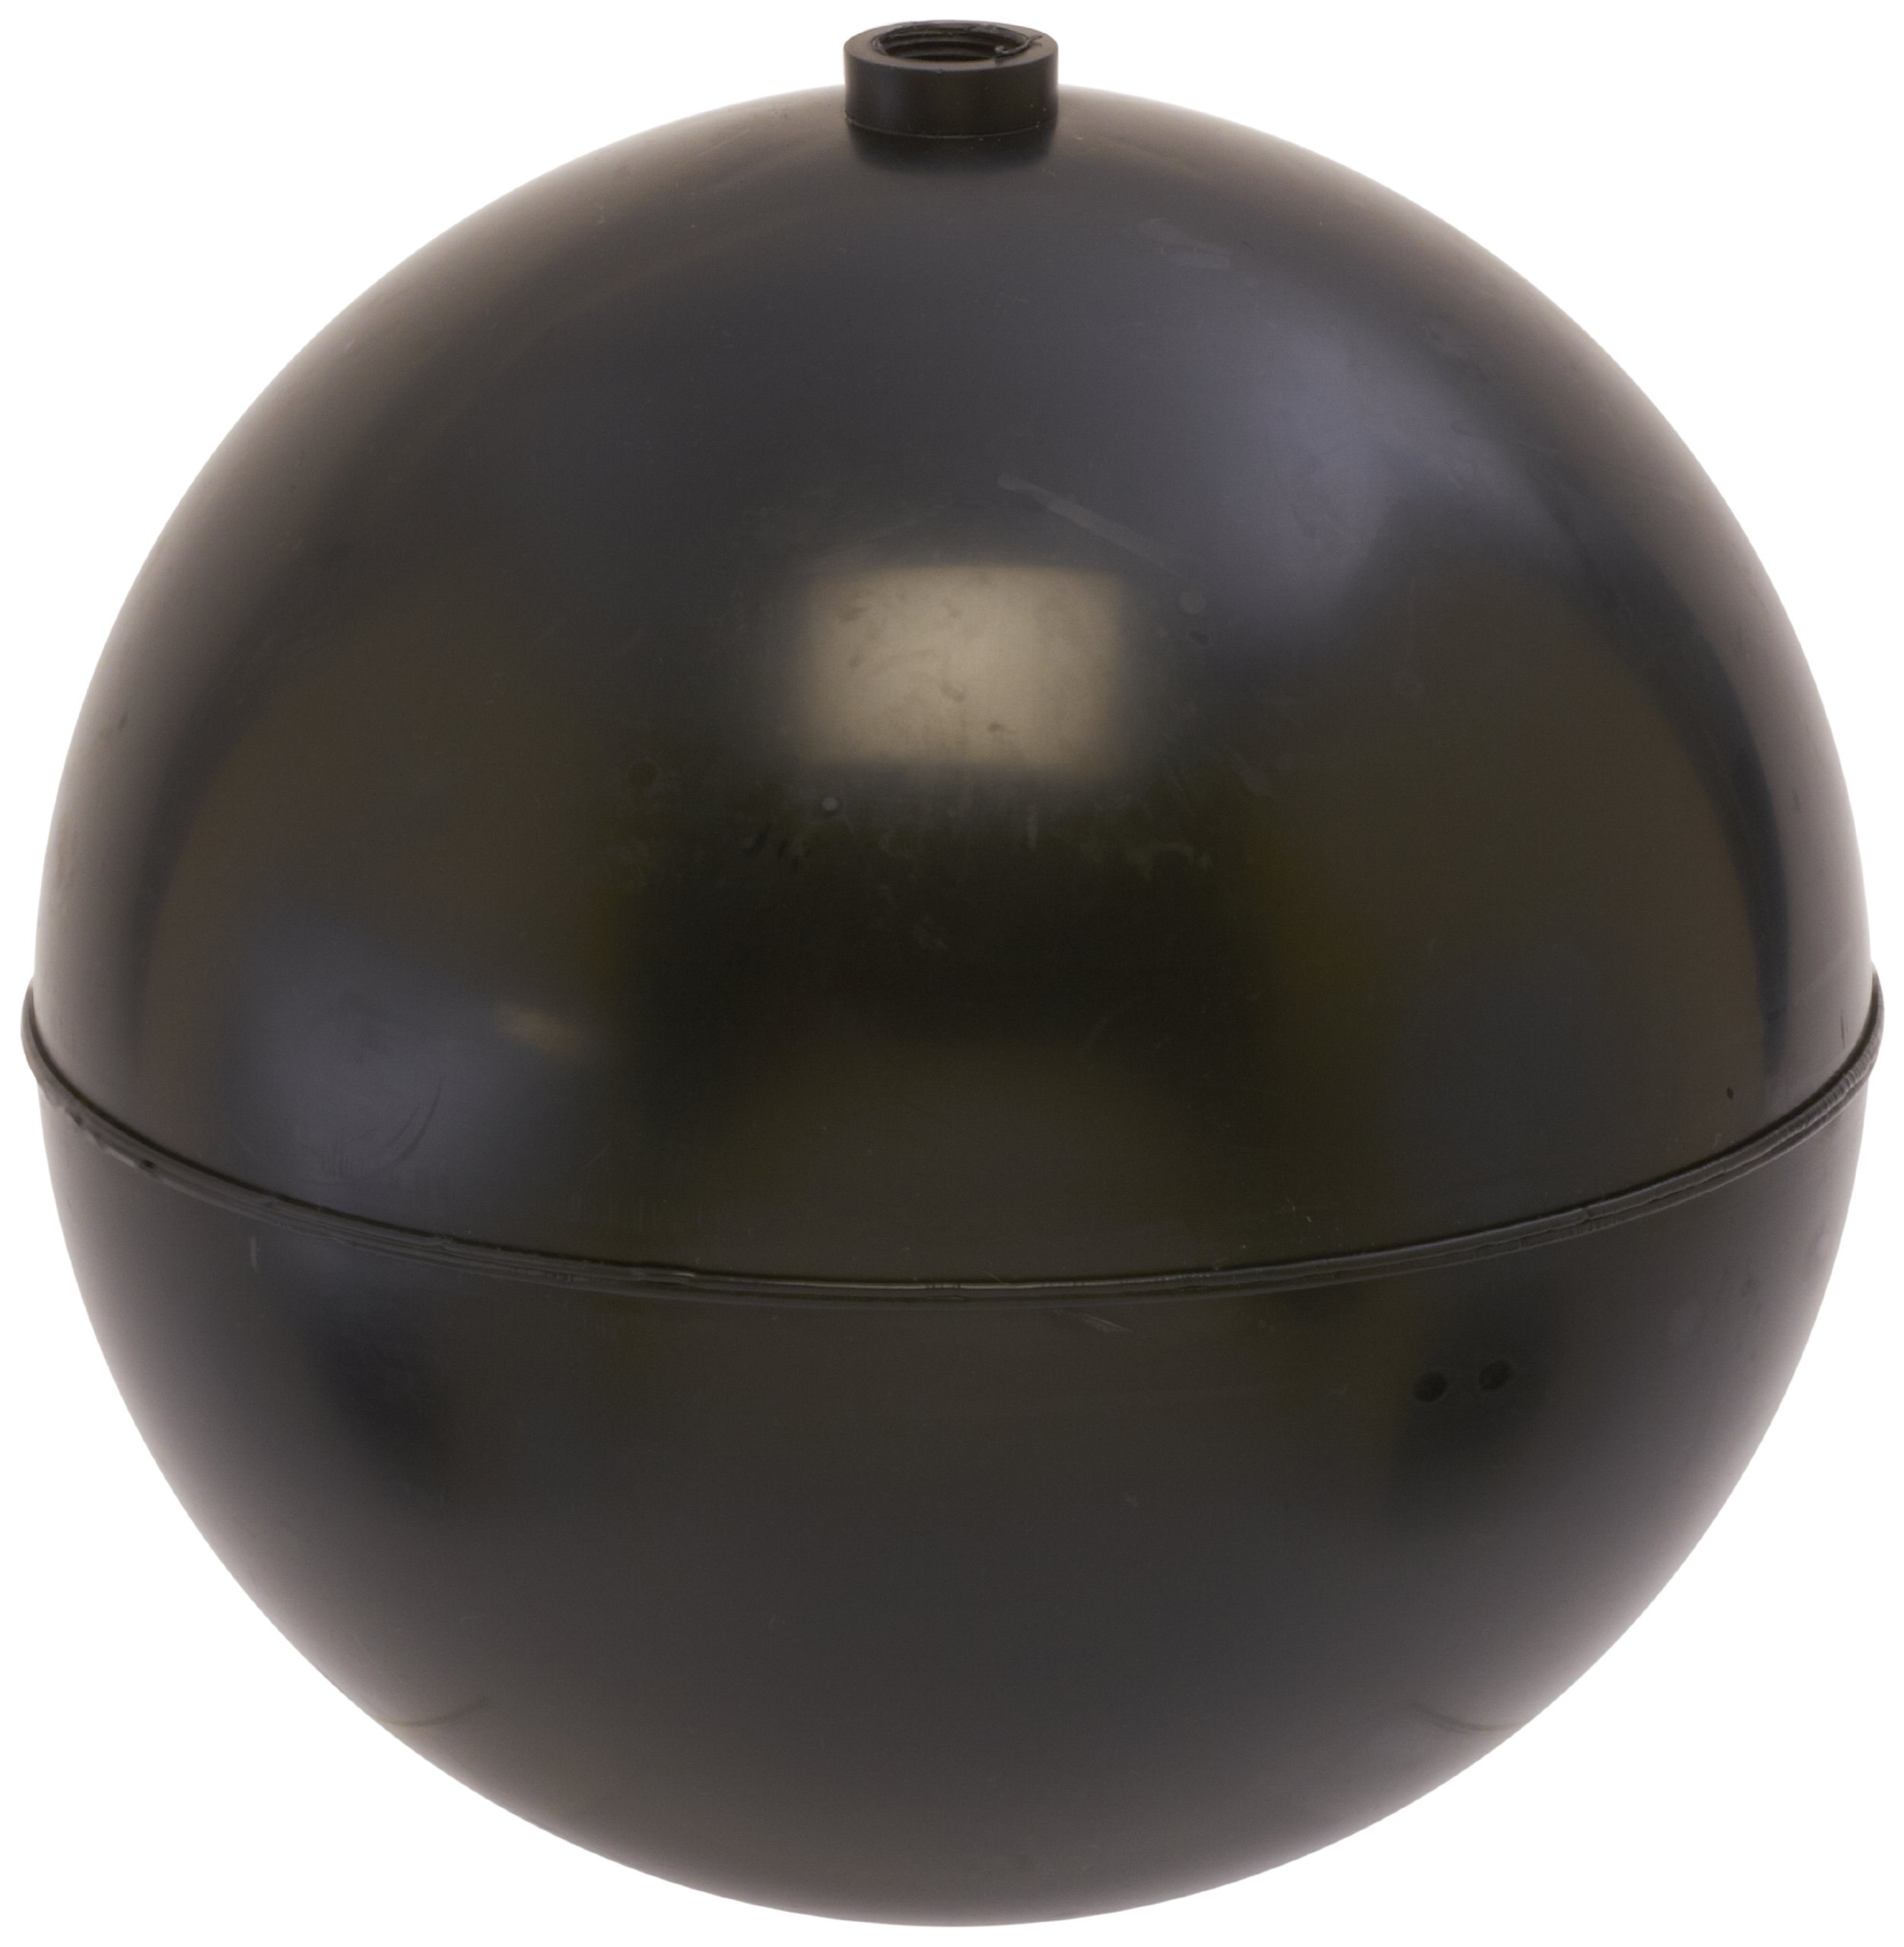 Robert Manufacturing PF Series Bob Spherical Polypropylene Float, 3/8''-16 Female Spud, 8'' Diameter, 158 oz Buoyancy